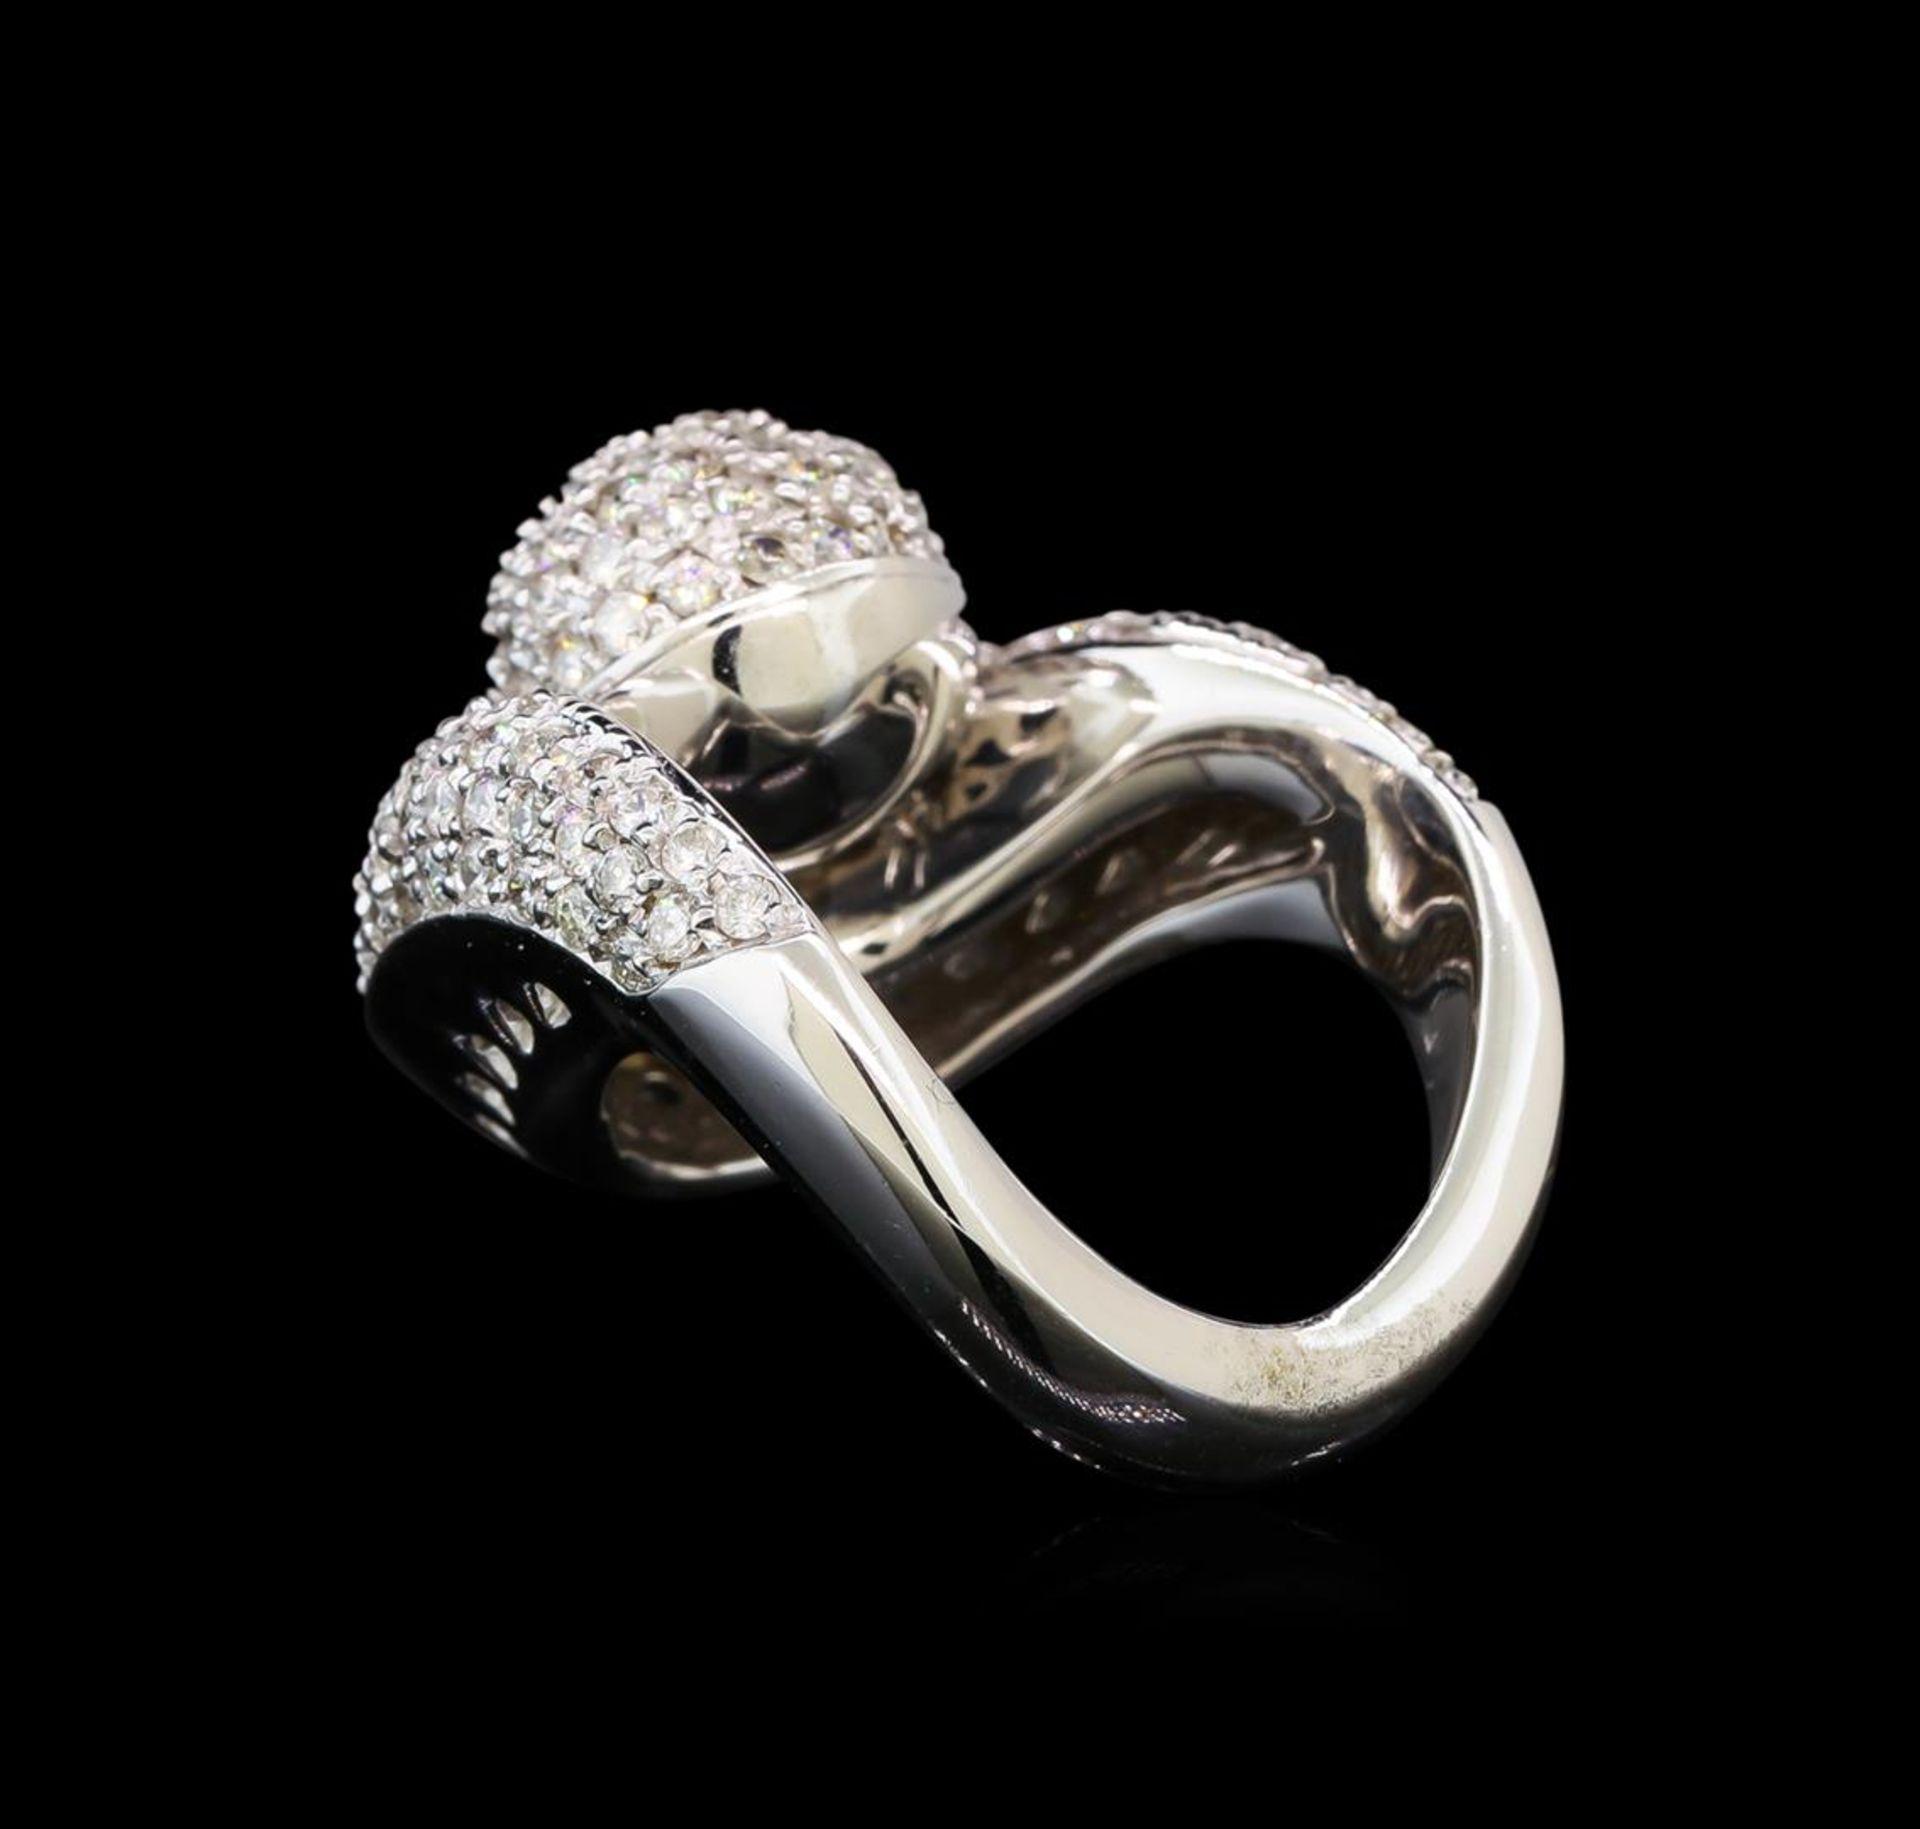 14KT White Gold 1.06 ctw Diamond Ring - Image 3 of 5